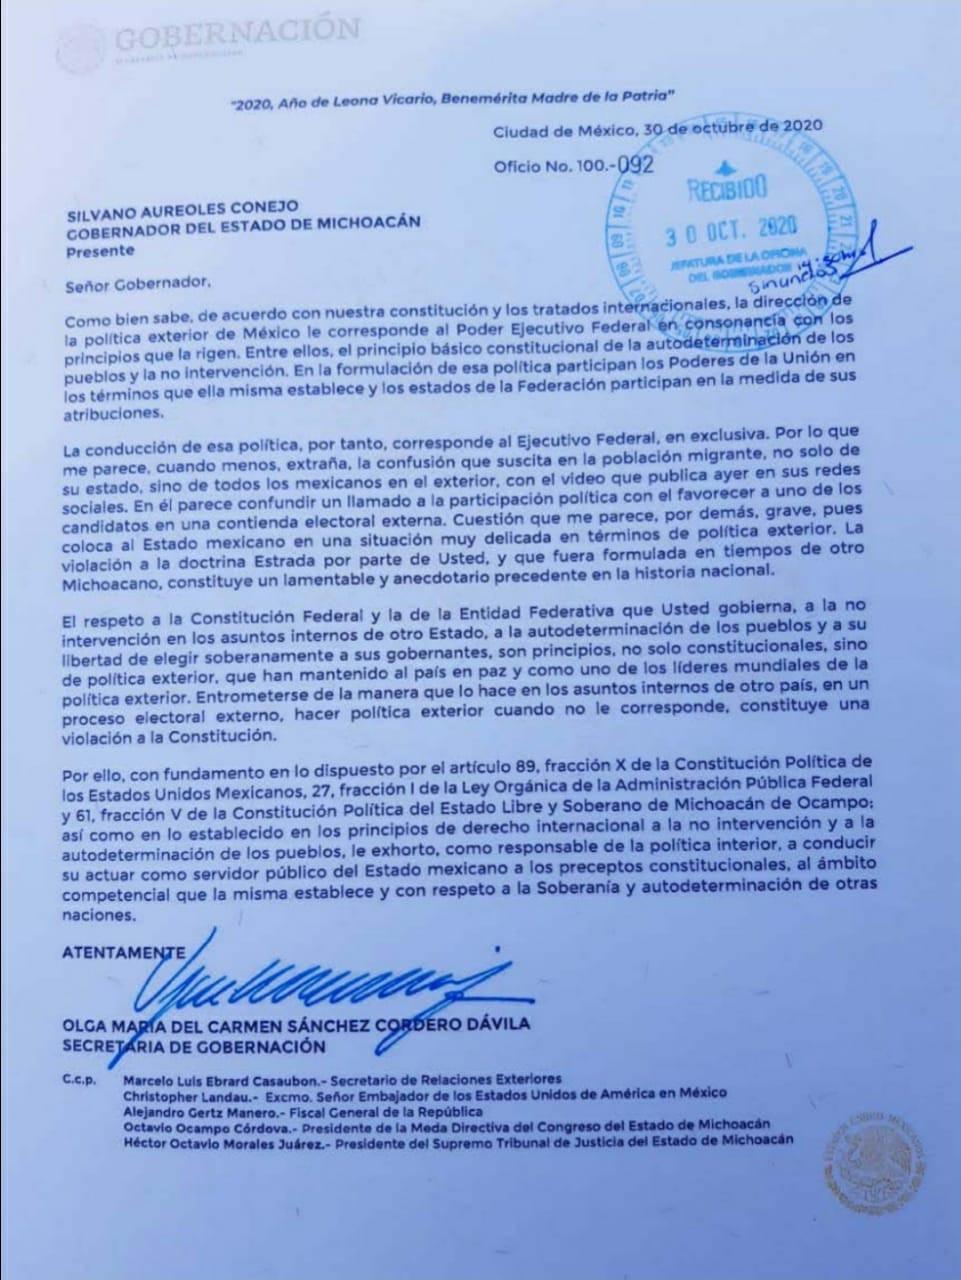 Secretaría de gobierno regaña a Silvano por violentar política exterior de México